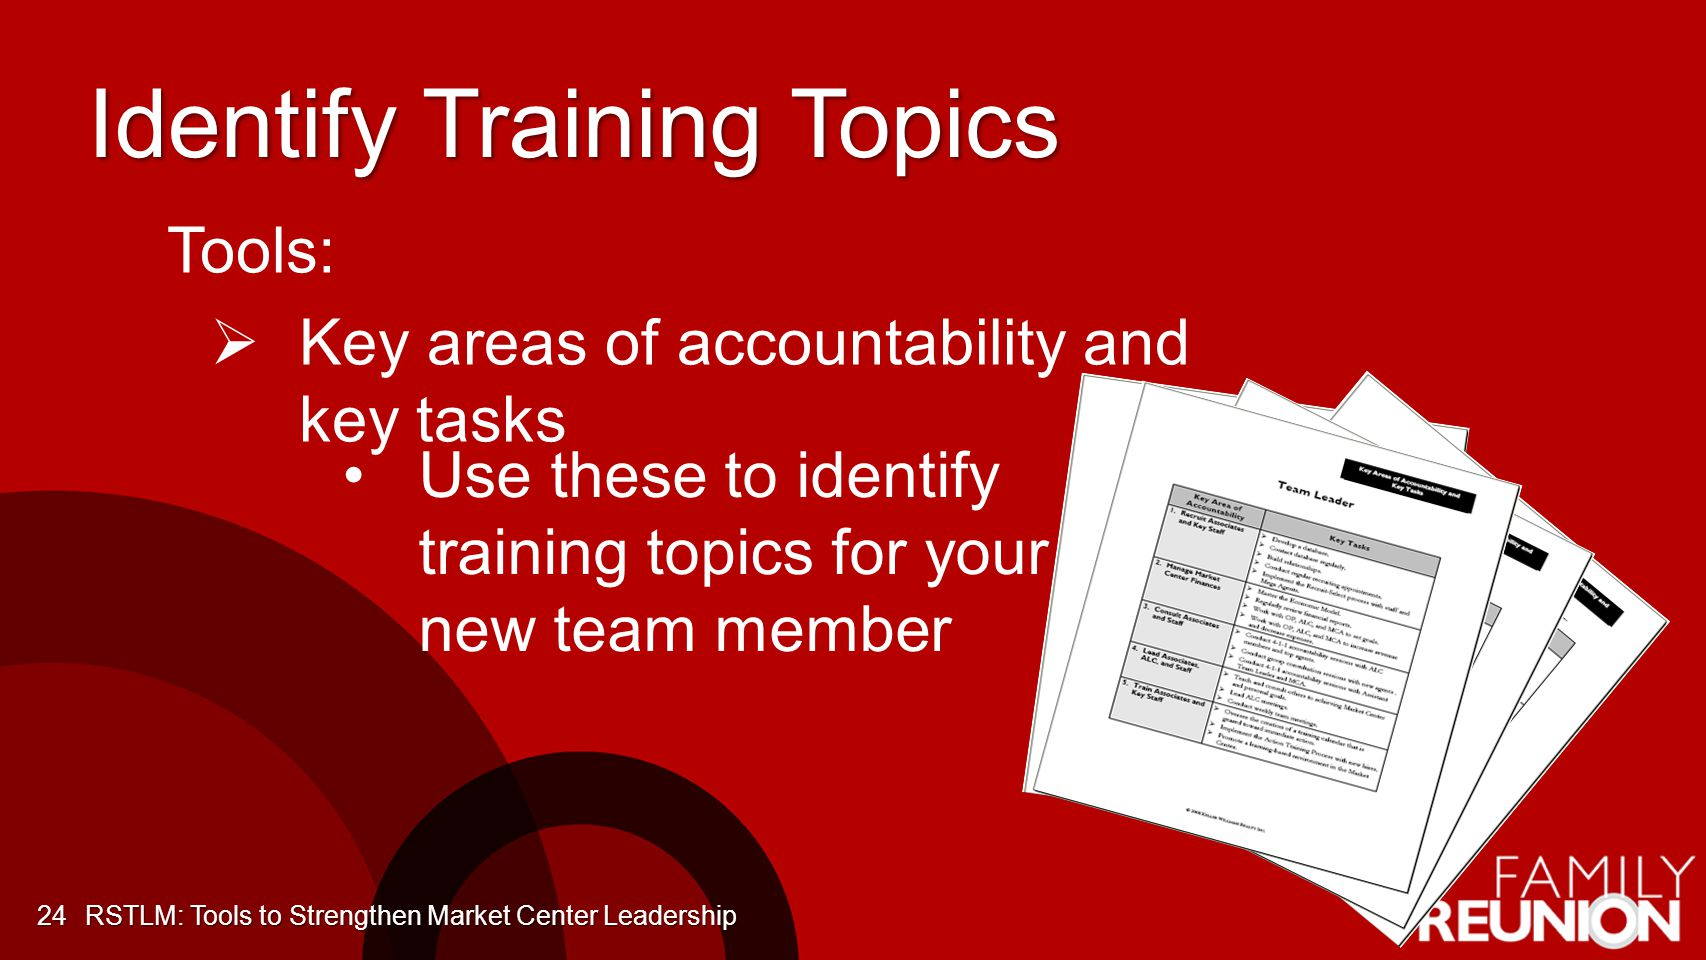 Identify Training Topics